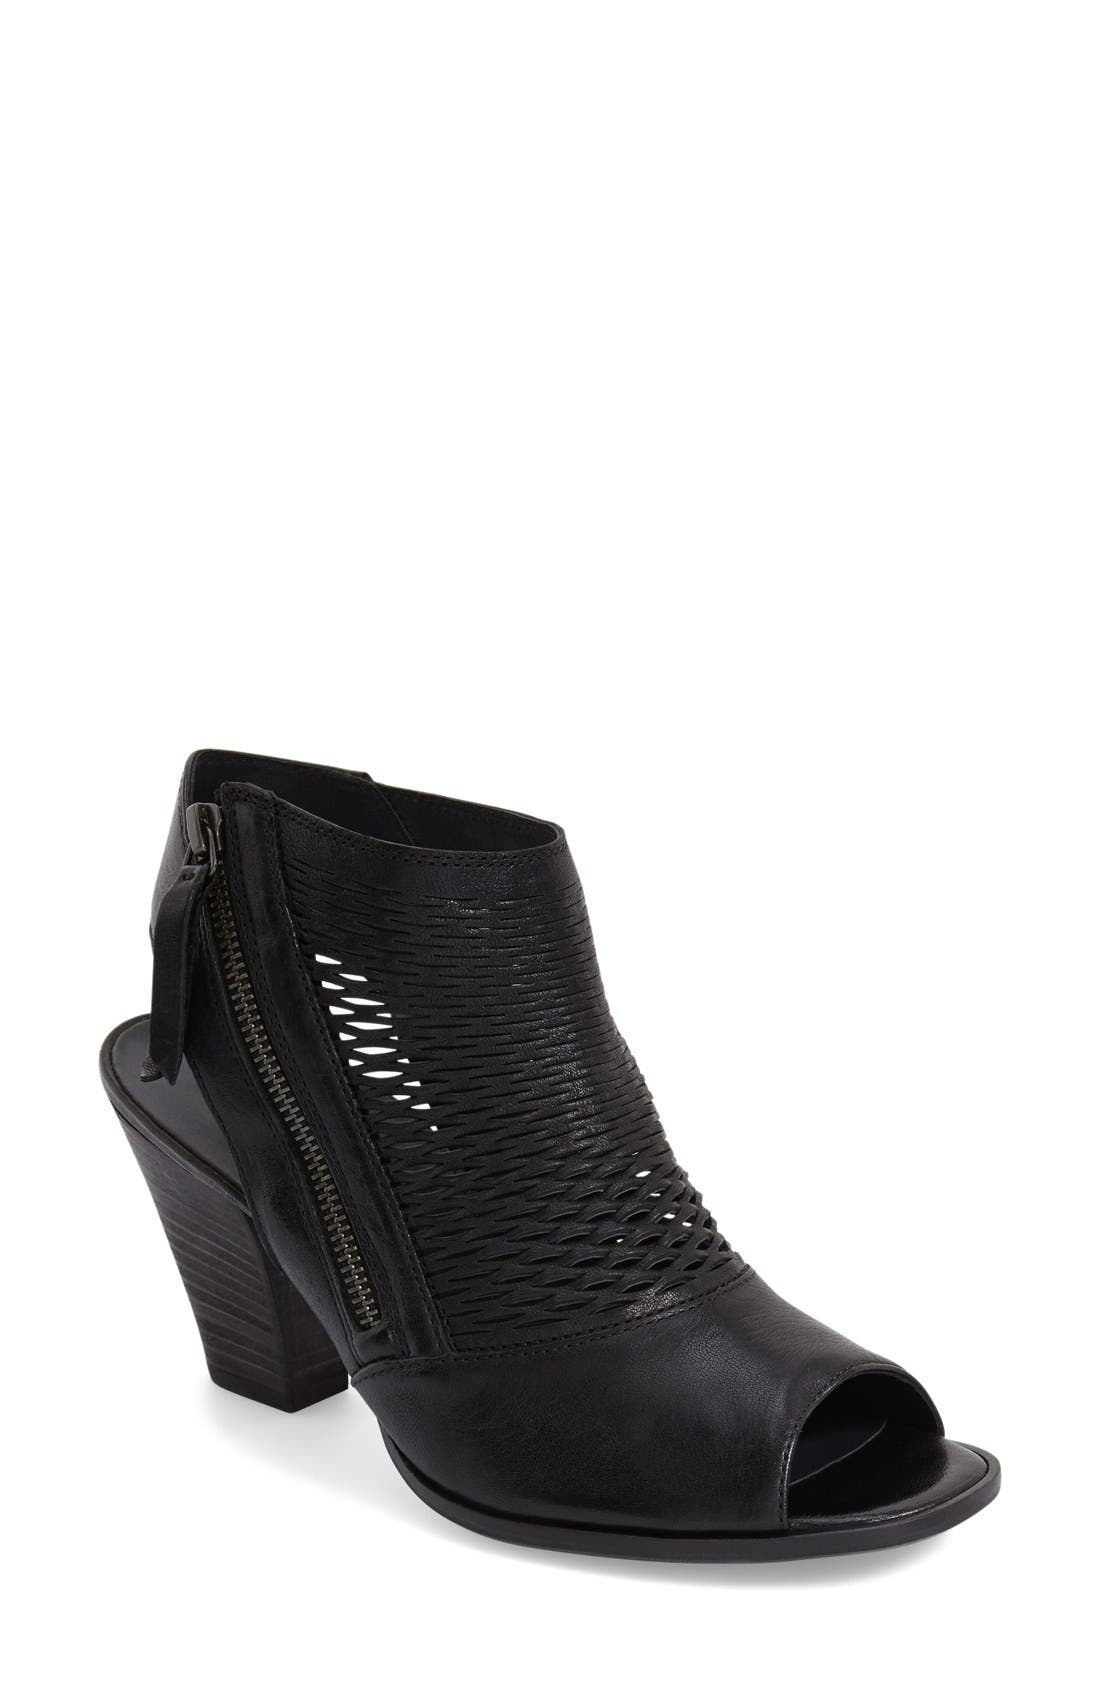 'Willow' Peep Toe Sandal,                         Main,                         color, Black Leather